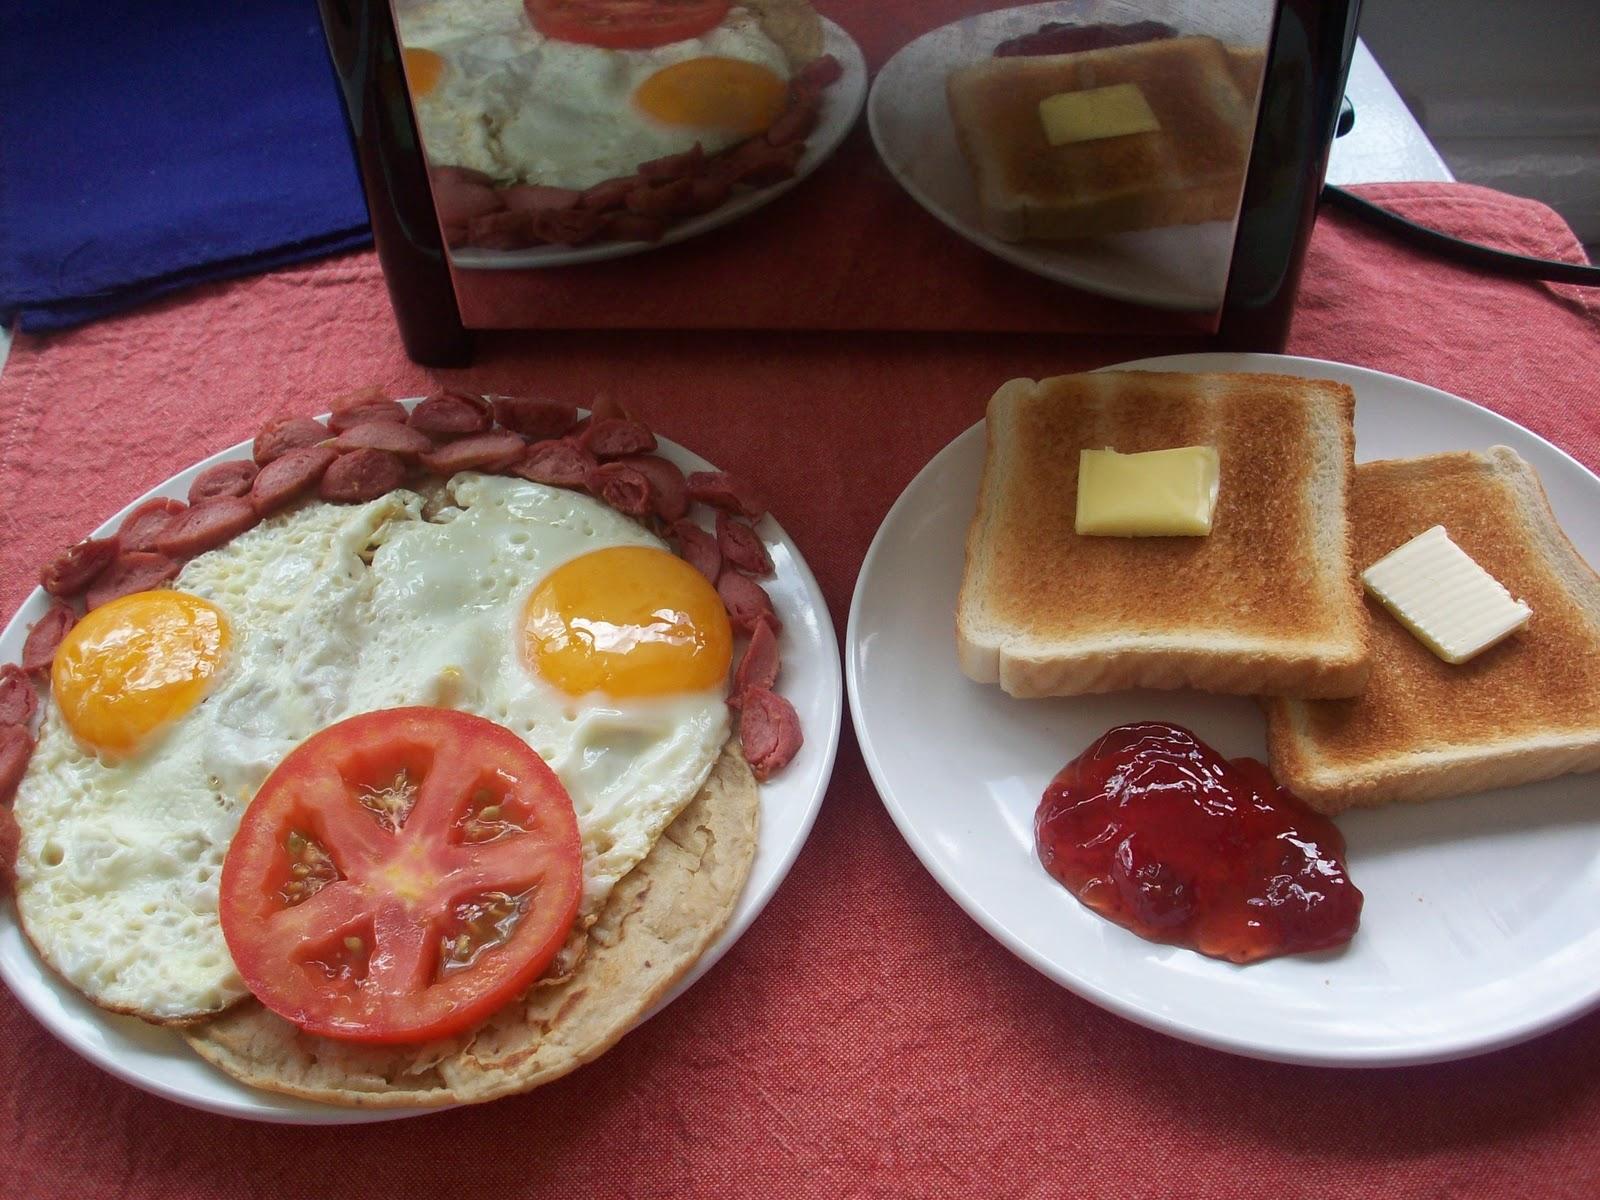 Desayuno del Domingo,para que no ayuneis que es maloooooooooo-http://1.bp.blogspot.com/_P0HXFregKRo/TJ5ZE0XoP5I/AAAAAAAADlI/Q13NhCCo9bM/s1600/100_1077.JPG